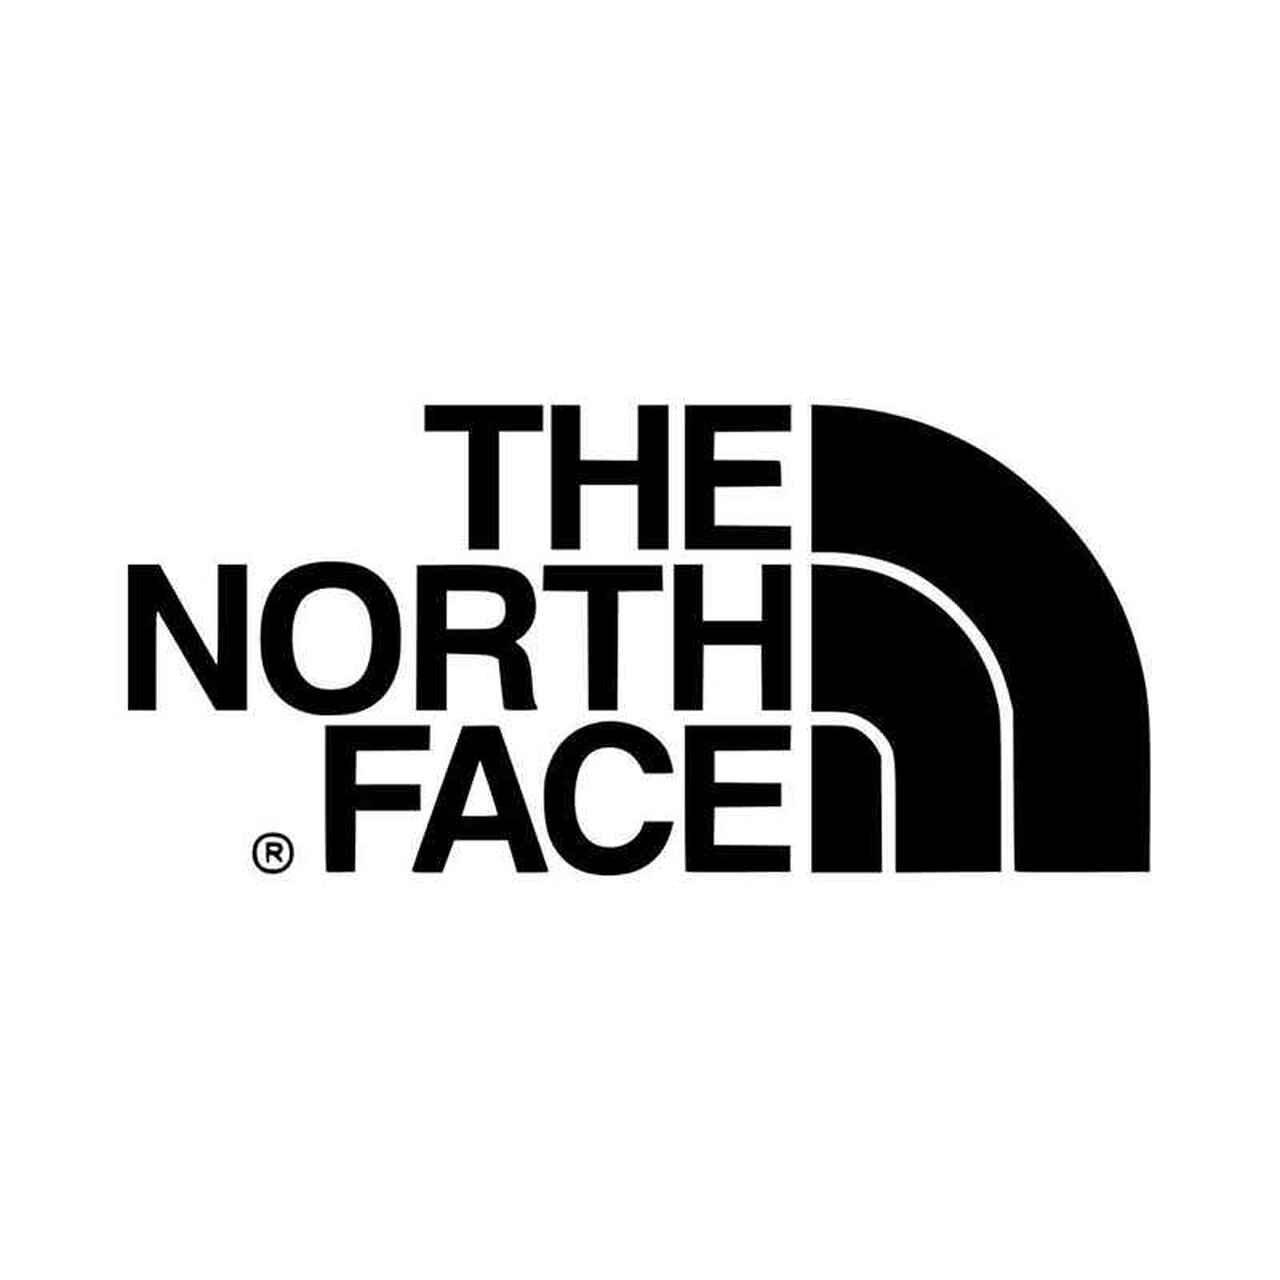 The-North-Face-Logo-Vinyl-Decal-Sticker__54140.1507851652.jpg